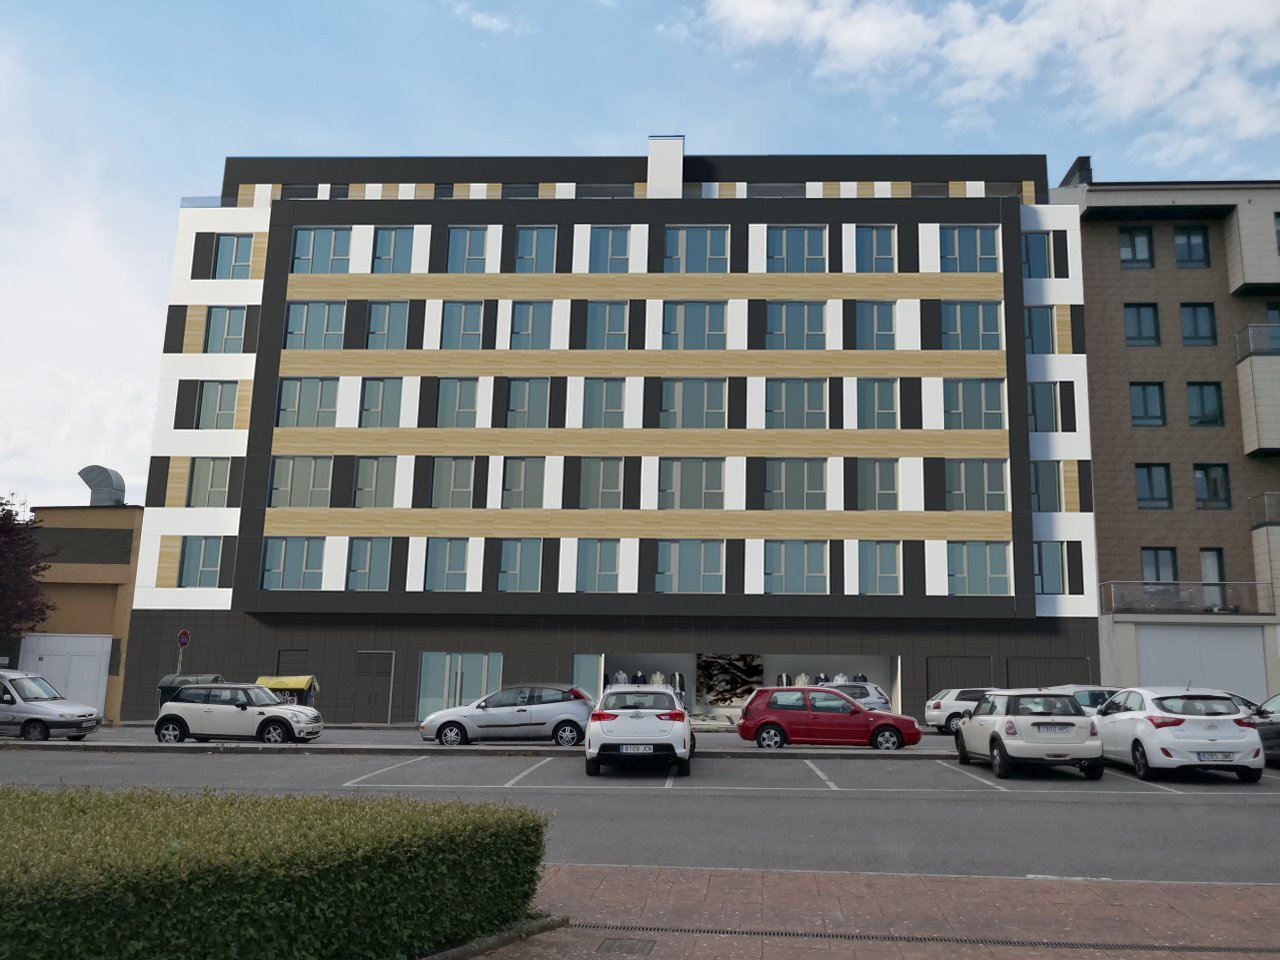 Ático con dos terrazas en obra nueva – en calle Illa Coelleira de Lugo